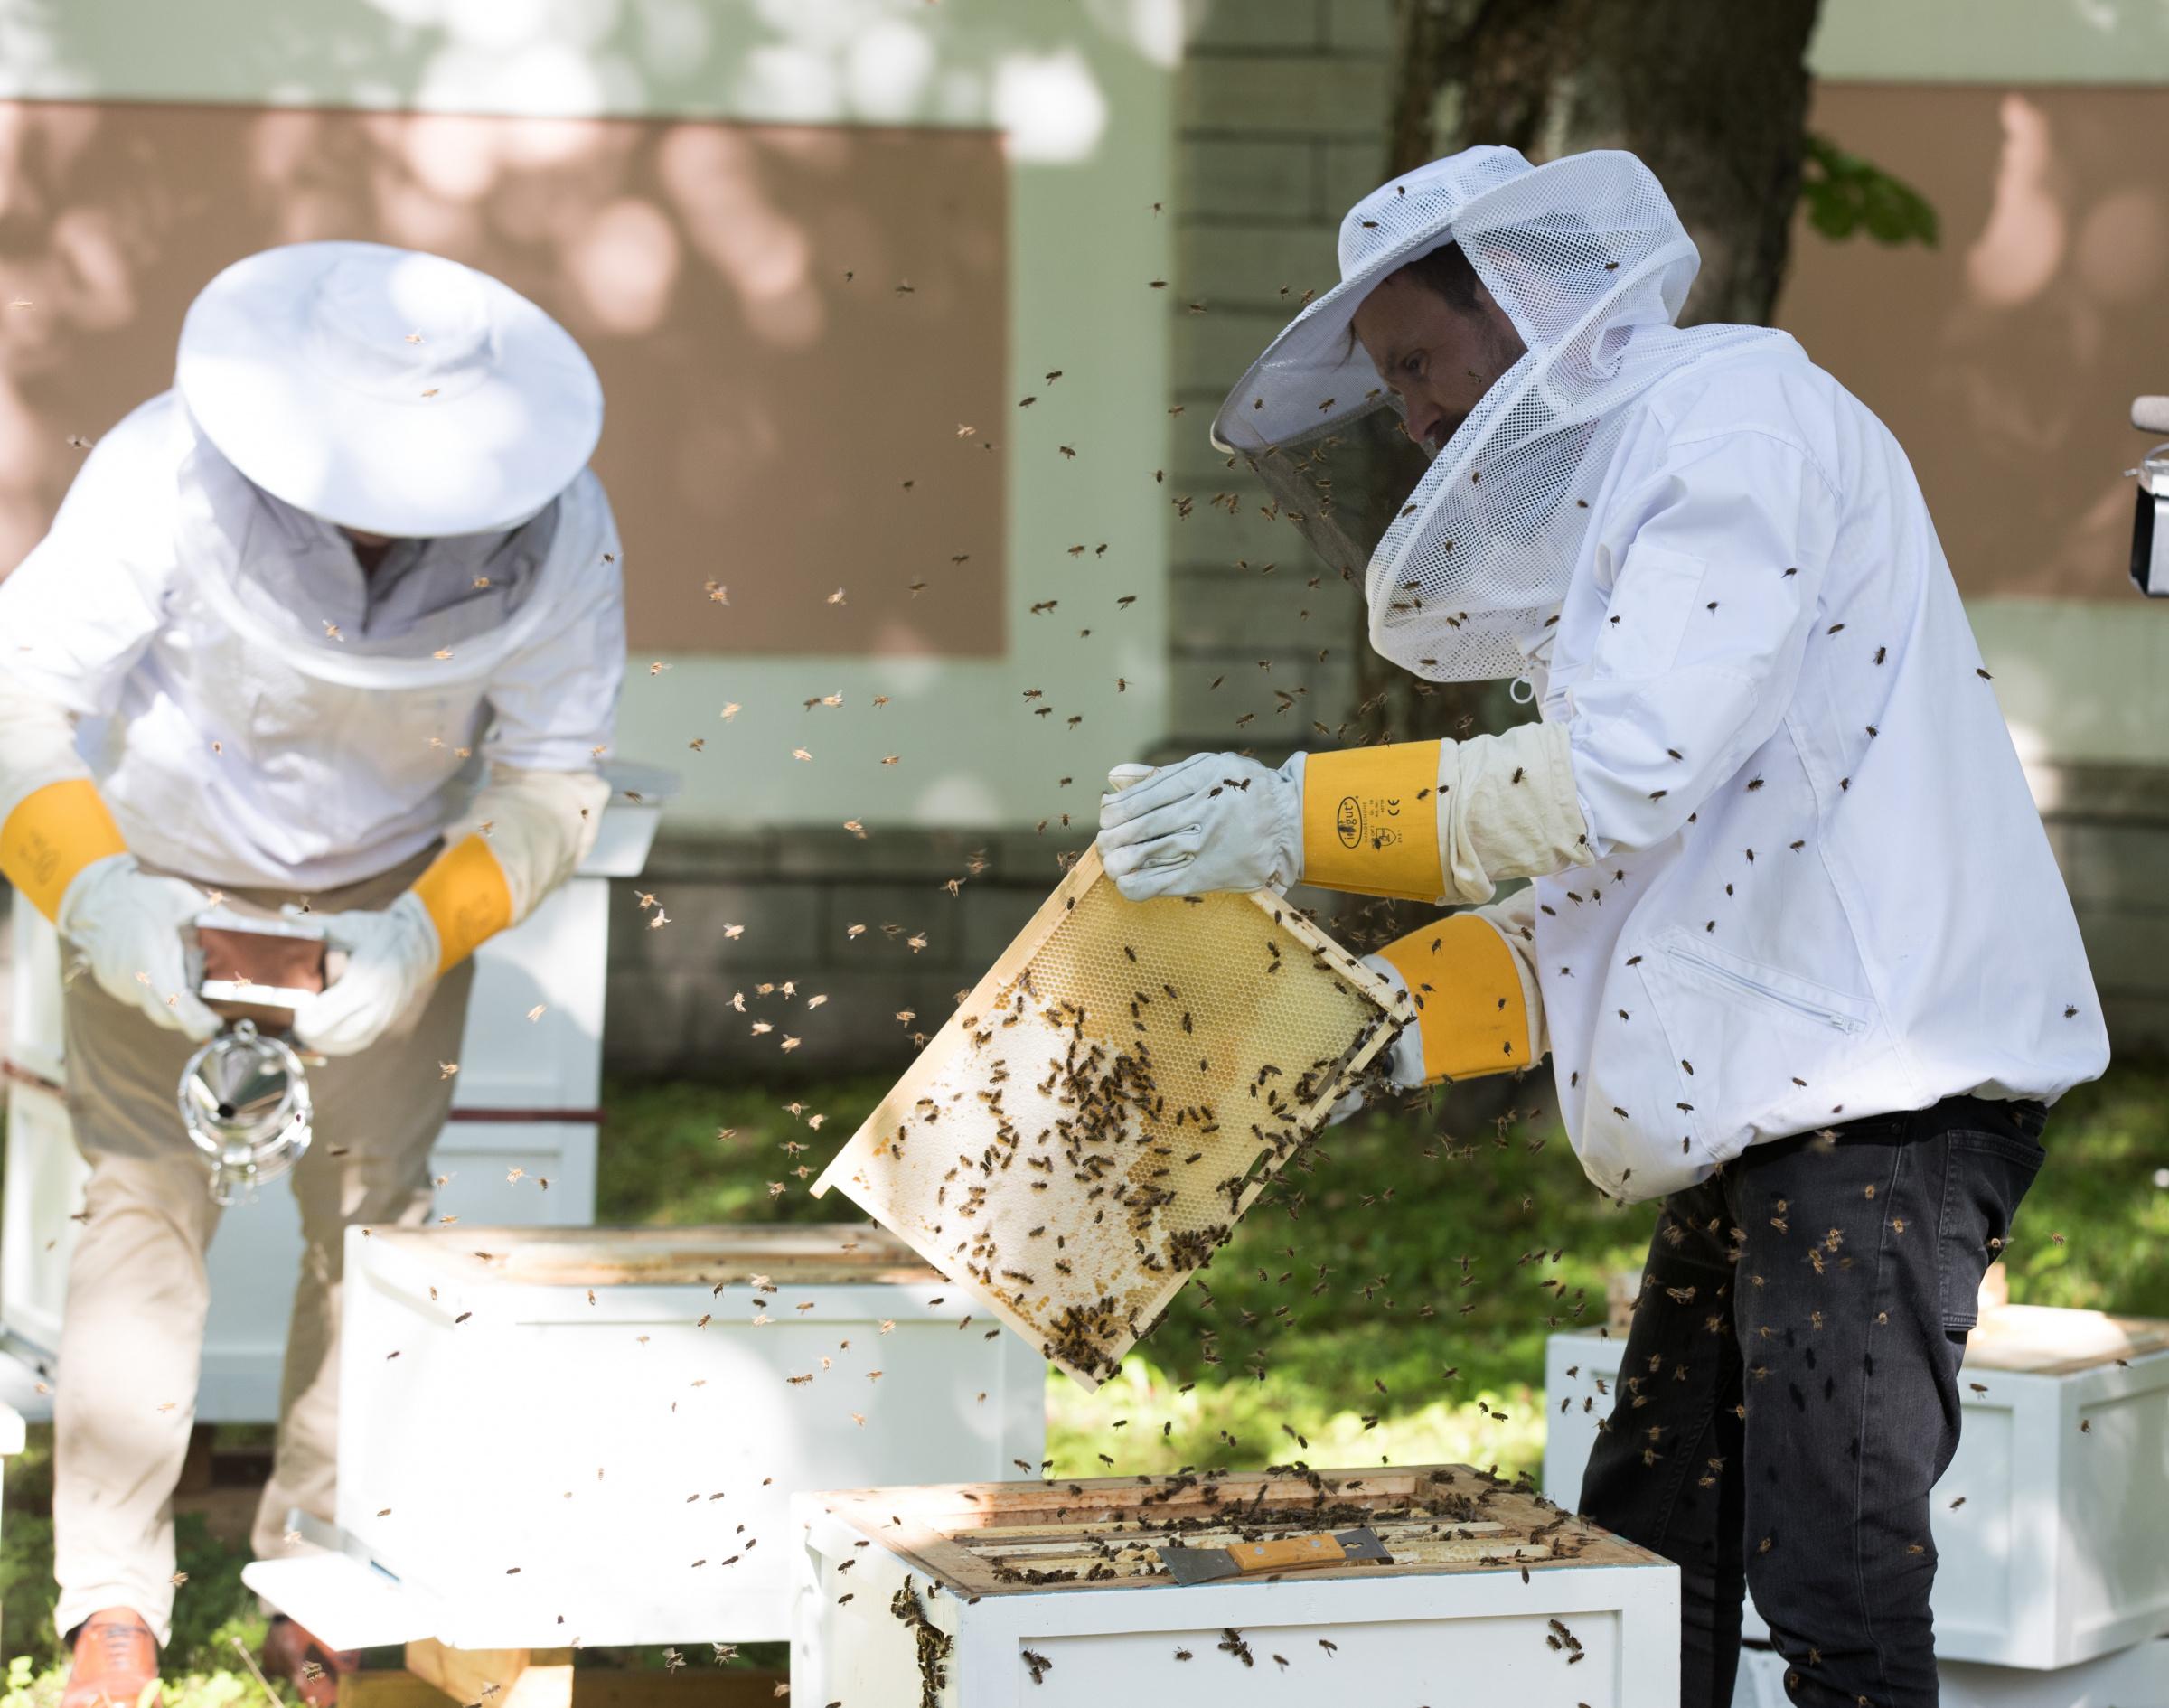 Mesilased, mee tootmine. Foto: LIIS TREIMANN/PM/SCANPIX BALTICS